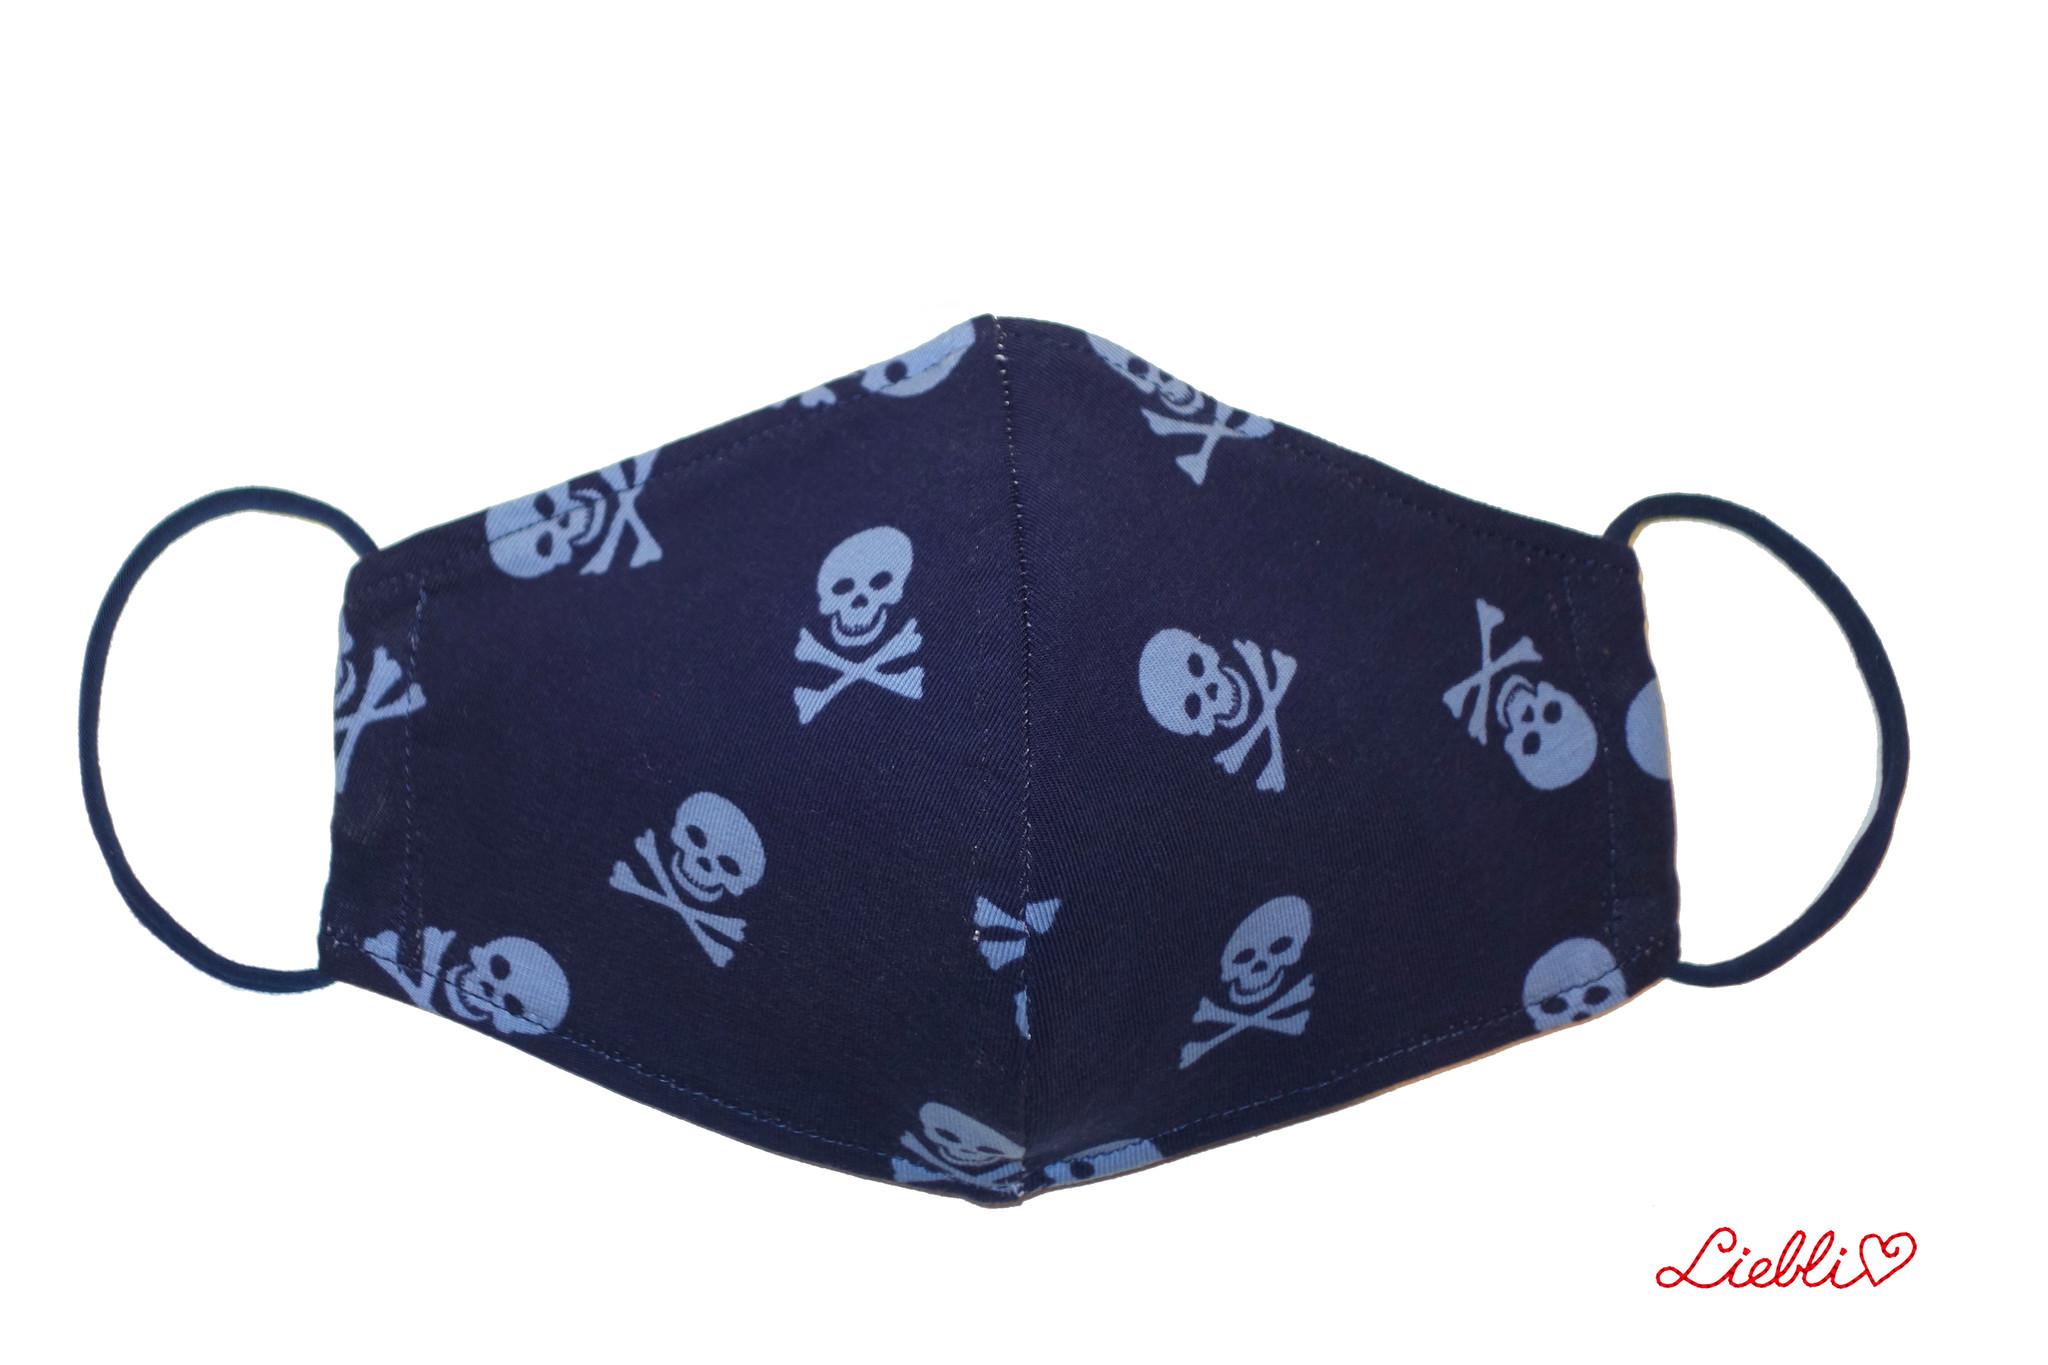 Coole Masken, Stoffmaske mit Totenköpfe, Totenkopfmaske